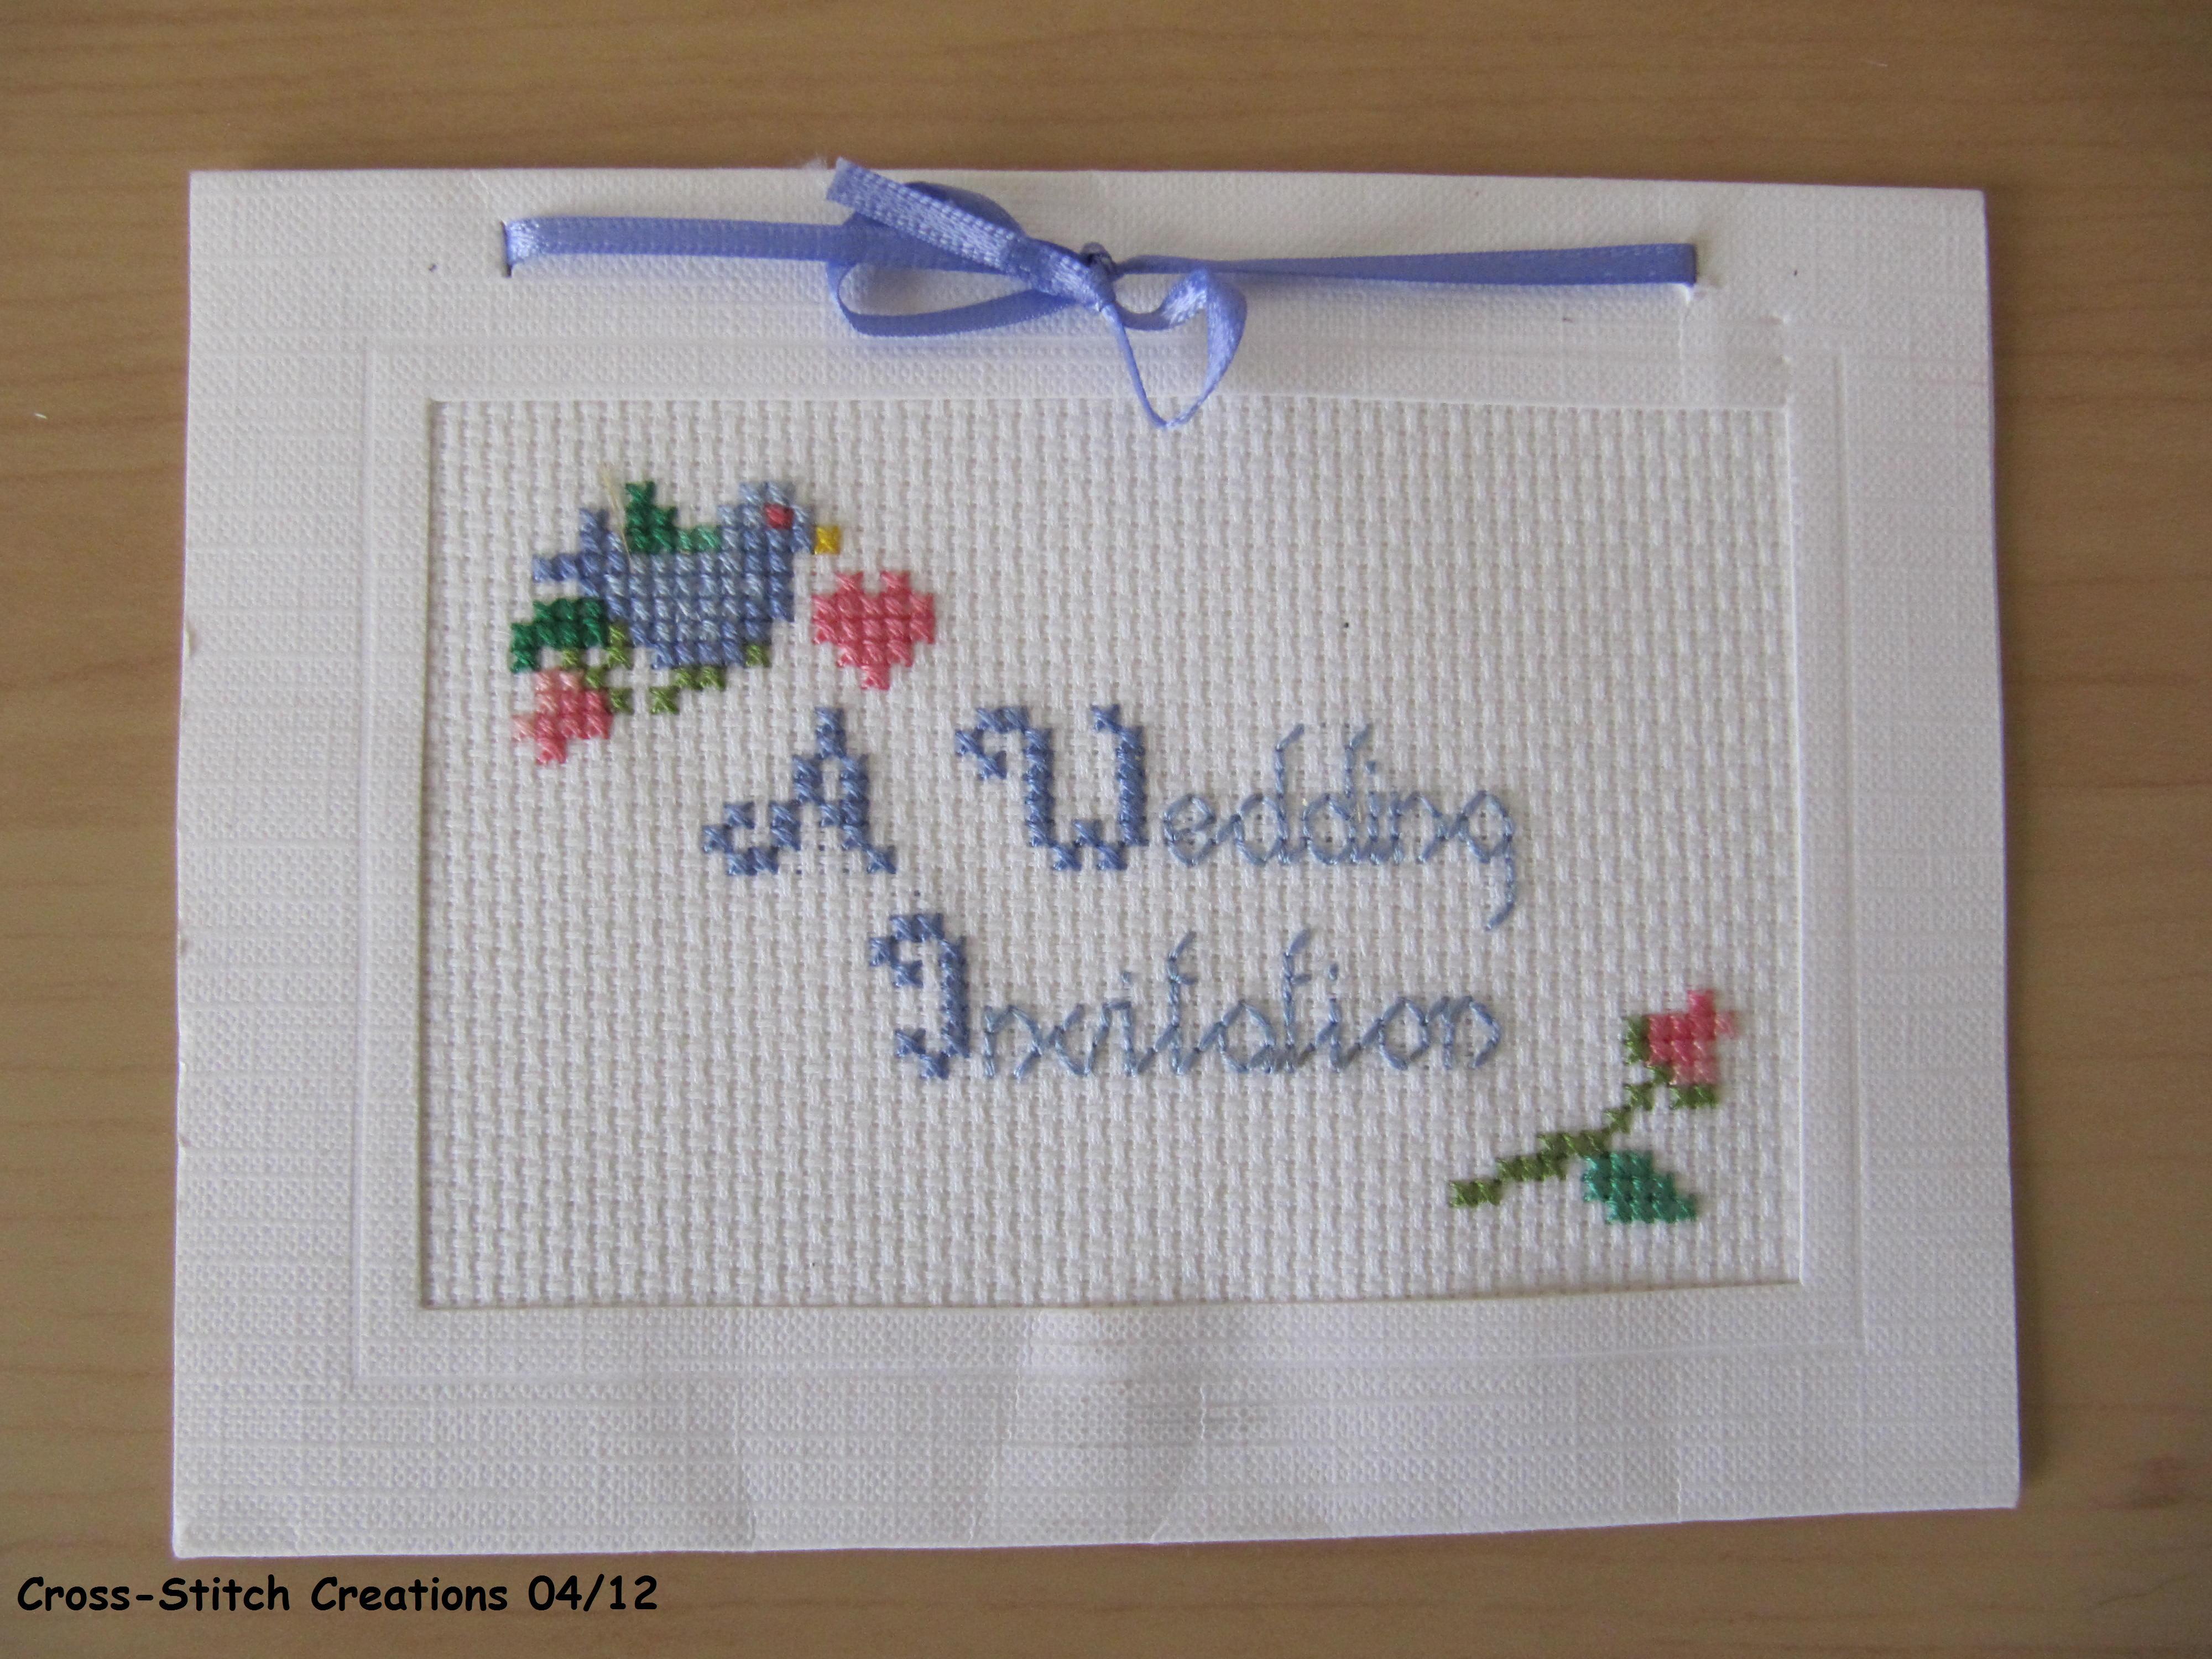 Cross Stitch Wedding Invitations | The Crafty Network